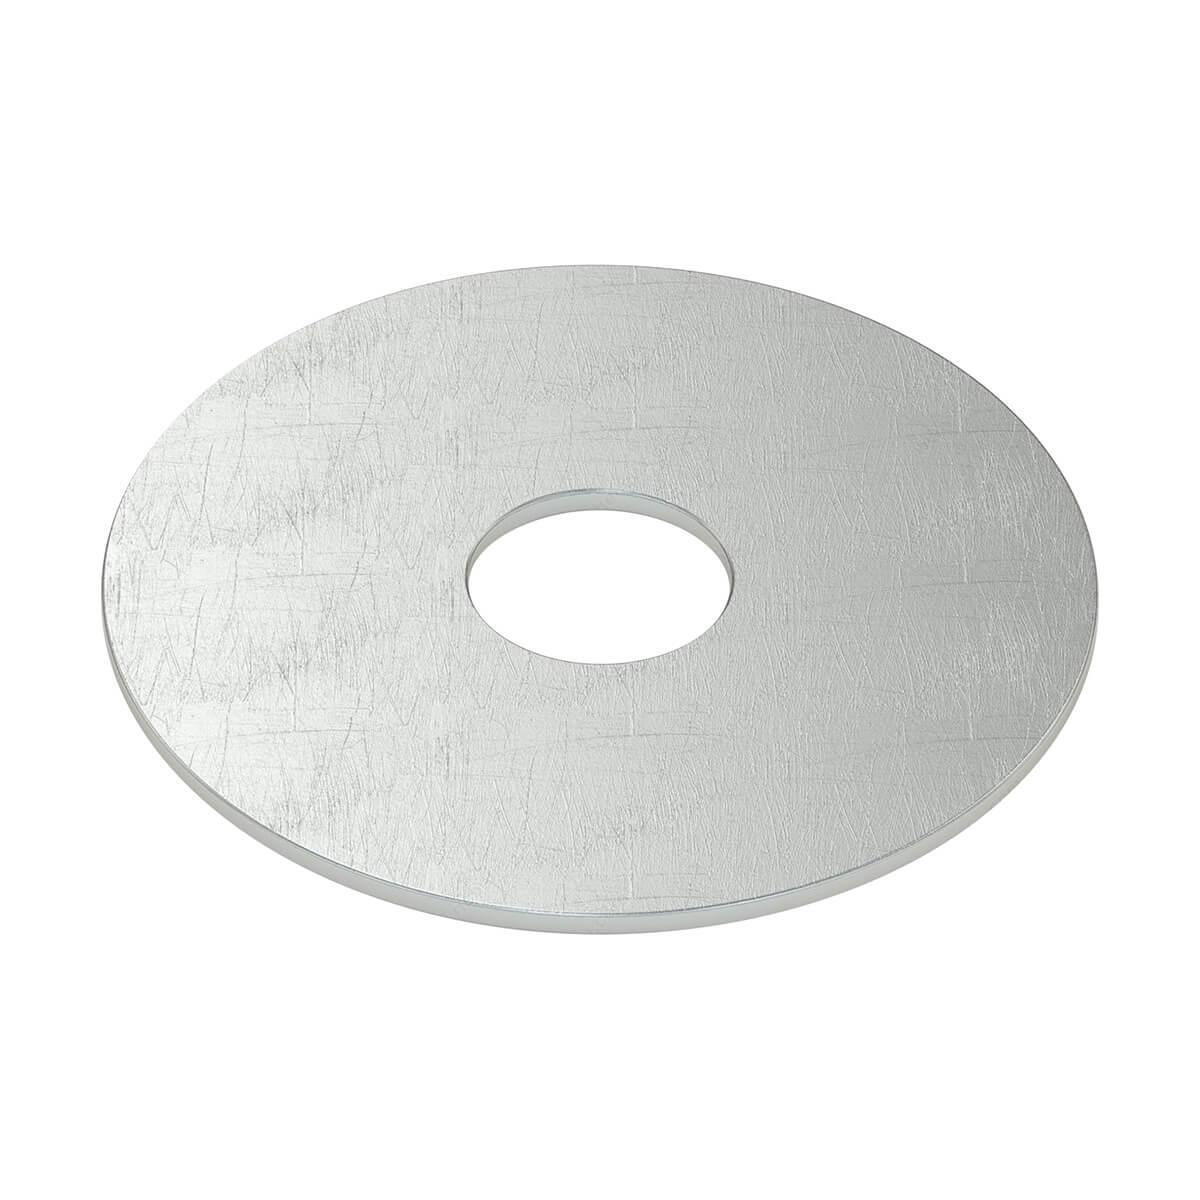 "Flat Washer - Steel - Fender - 1/4"" - 5/Box"